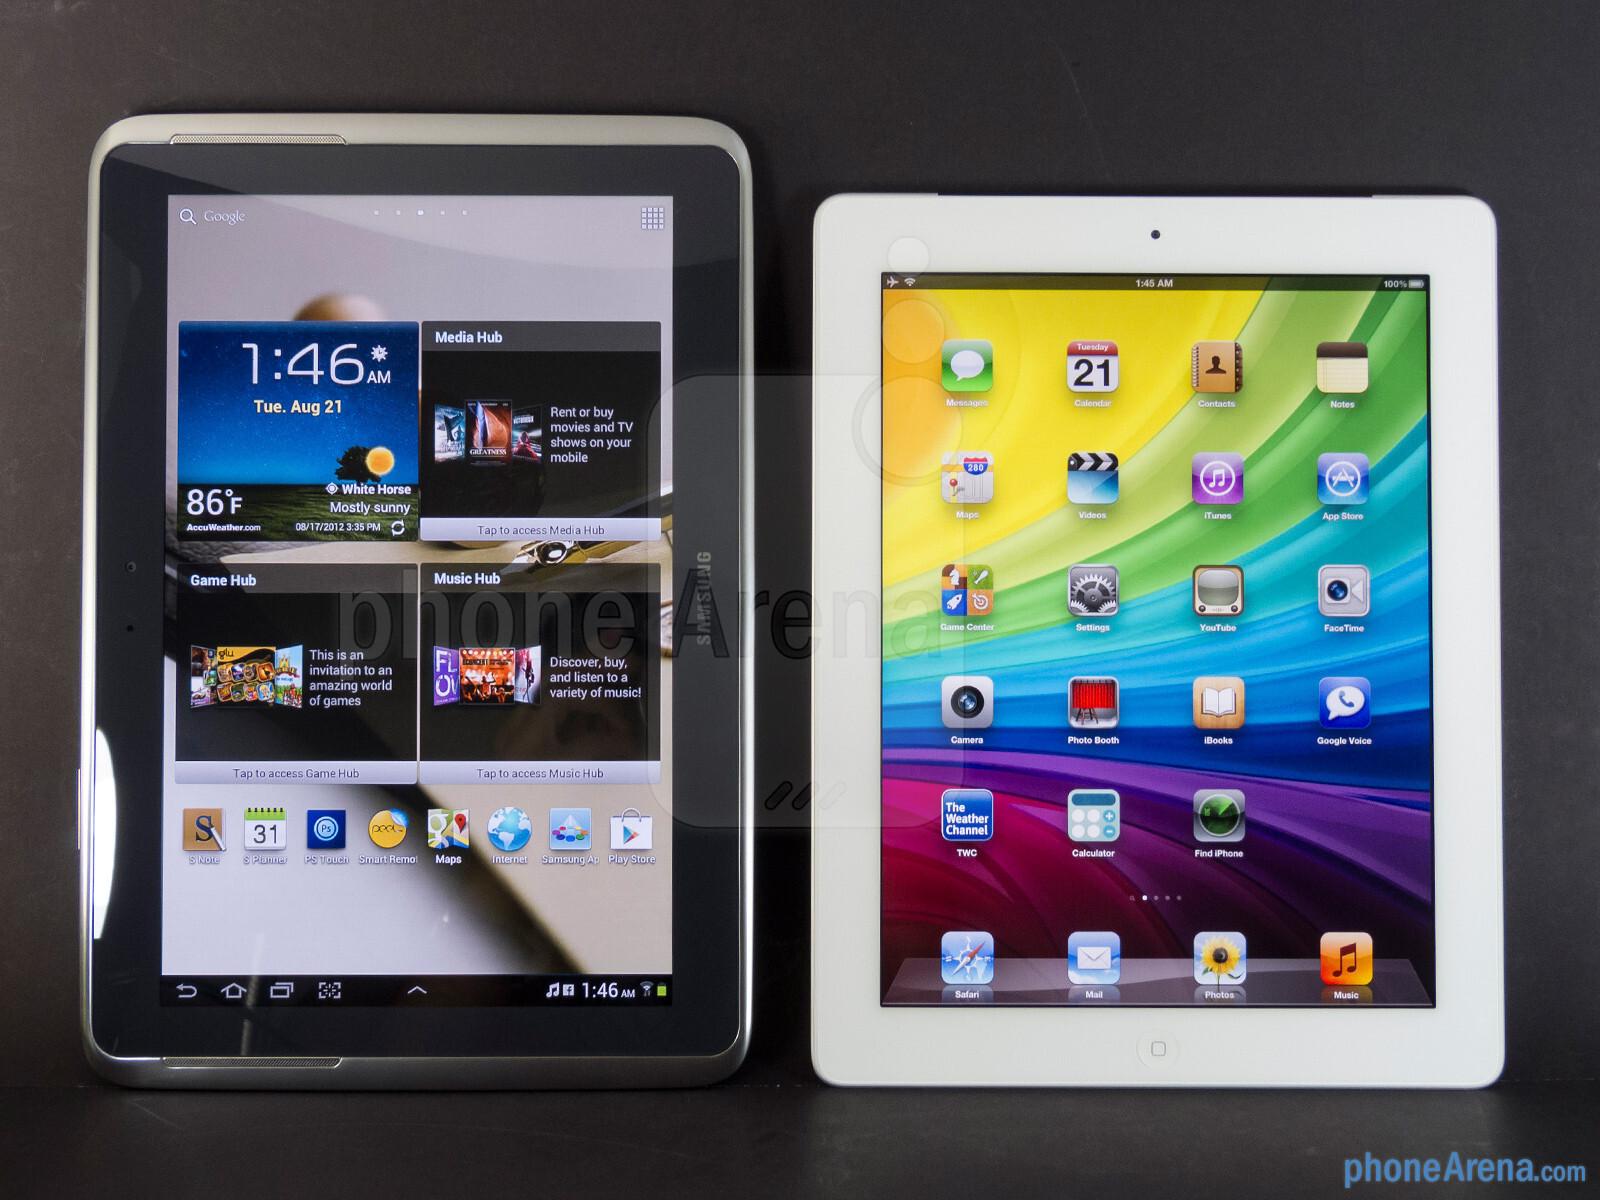 Samsung Galaxy Note 10.1 vs Apple iPad 3